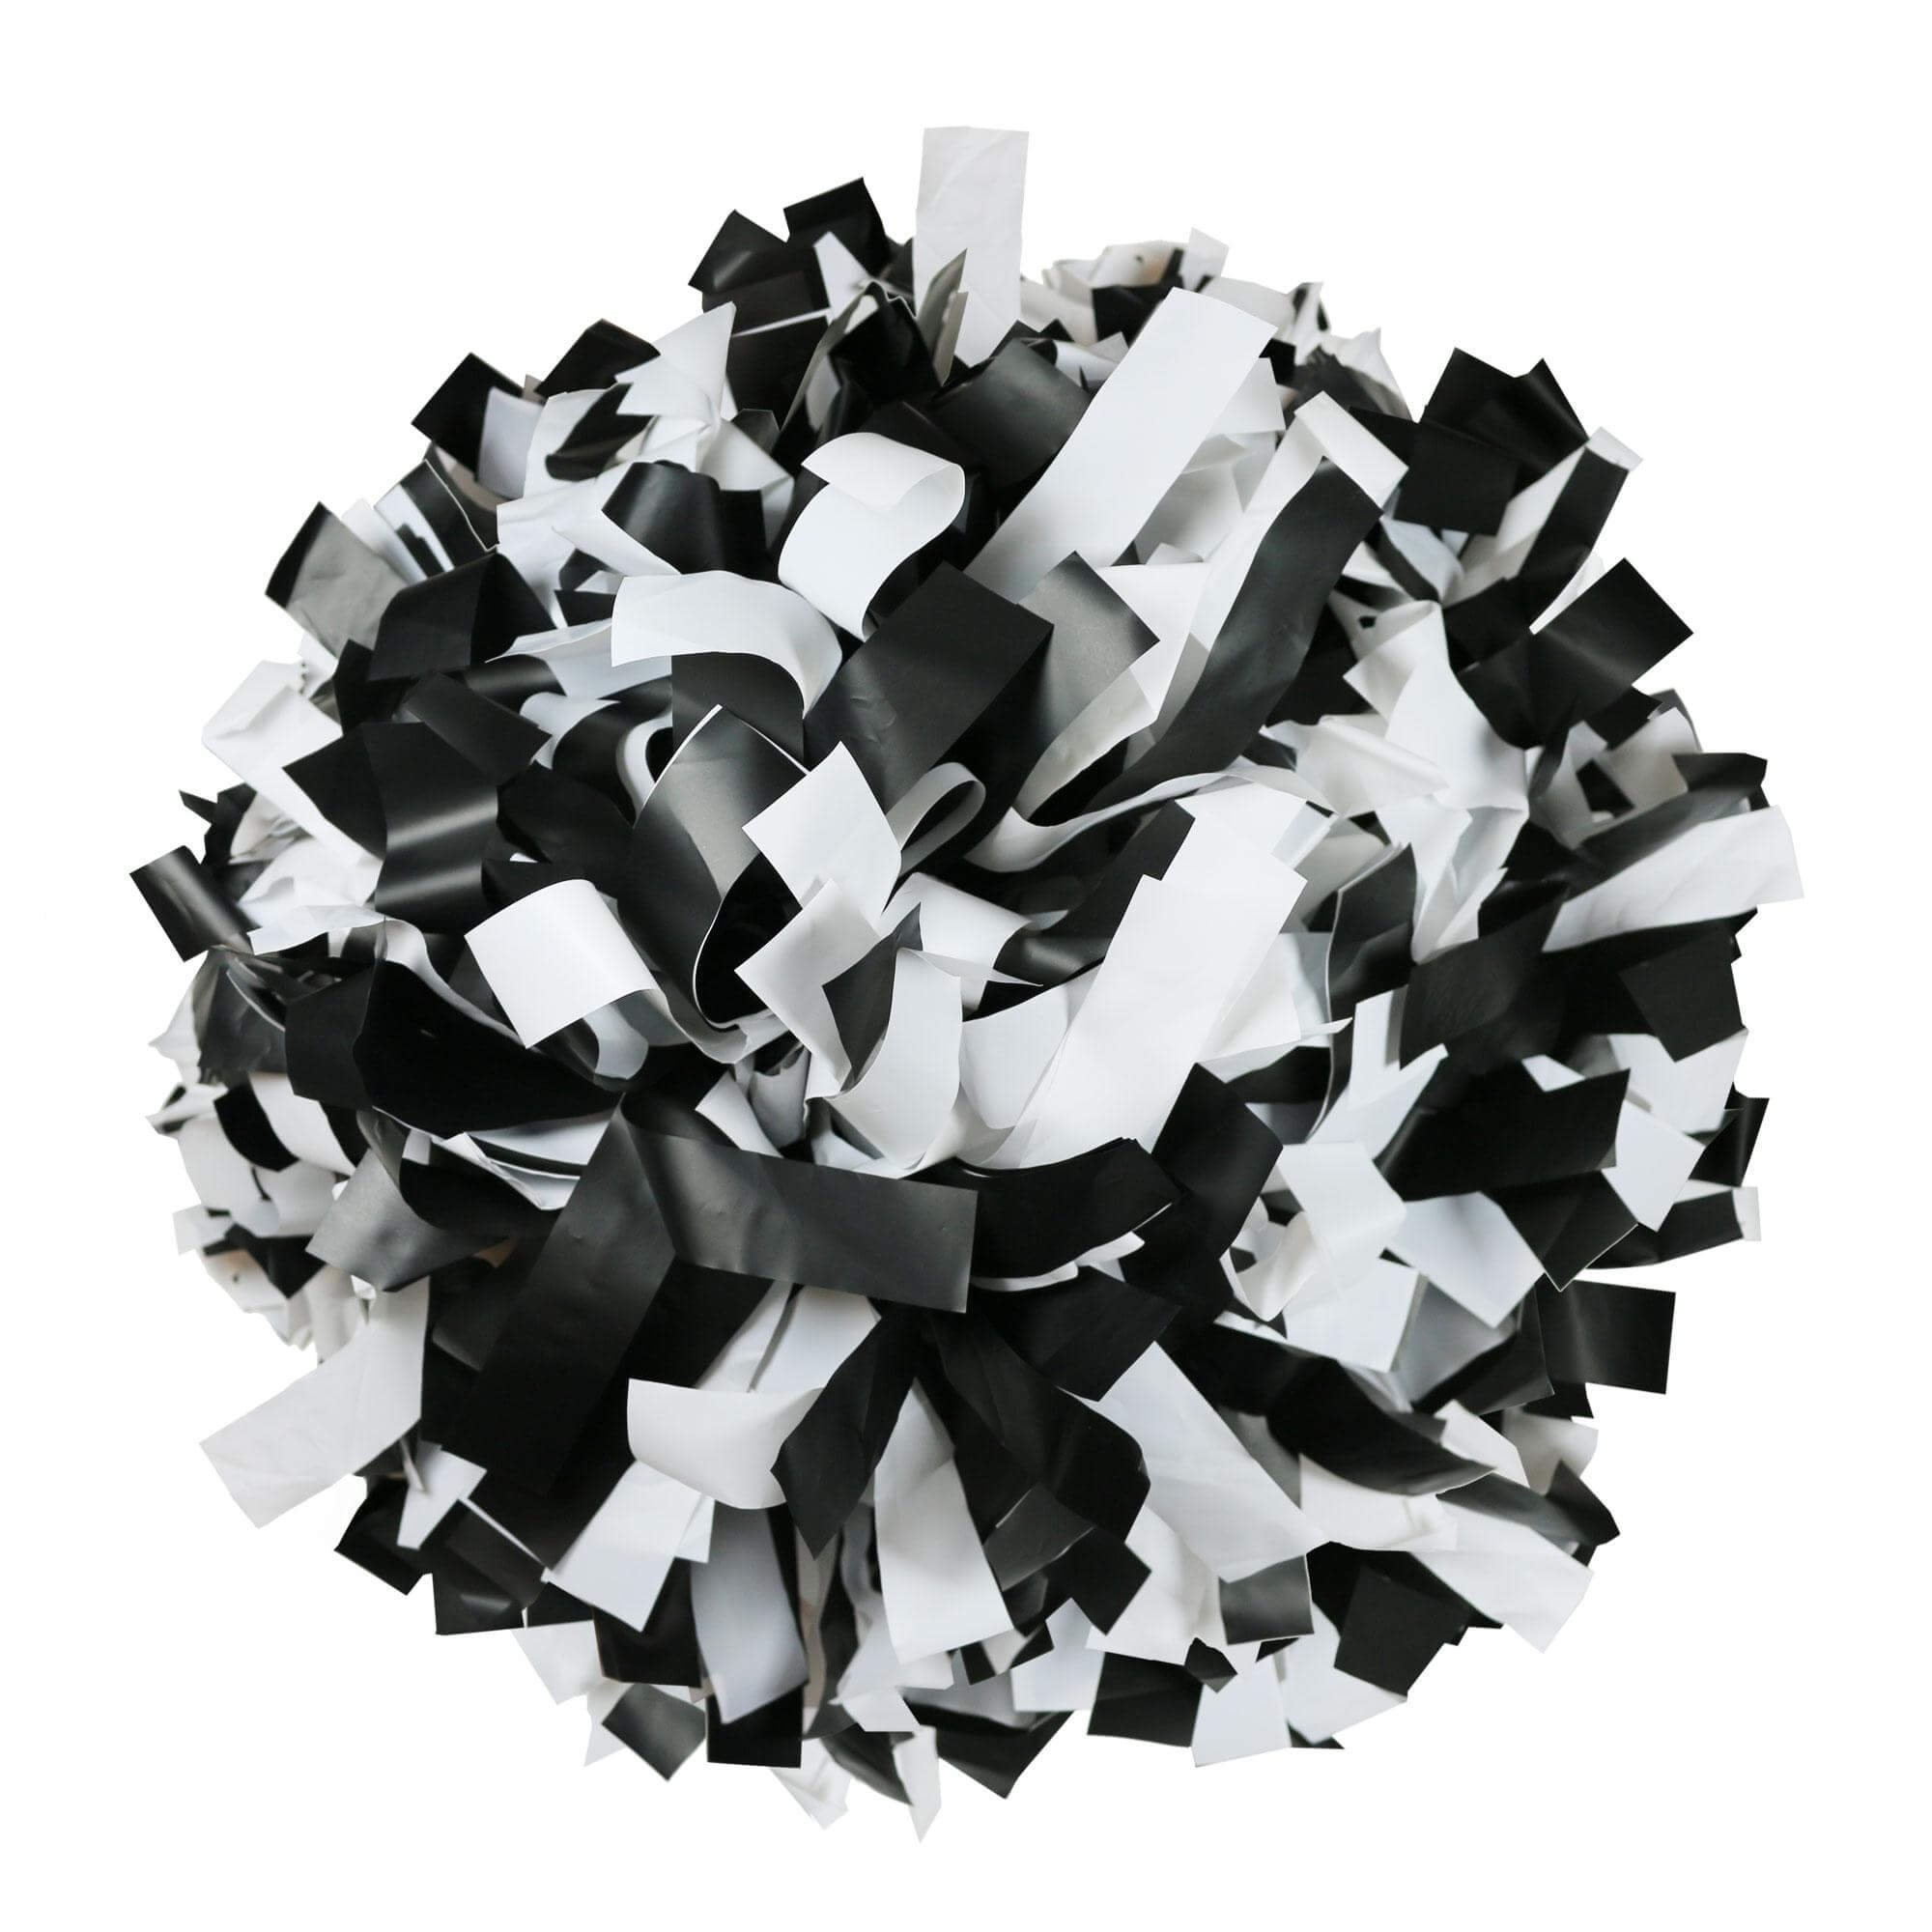 Danzcue Black/white Plastic Poms - One Pair